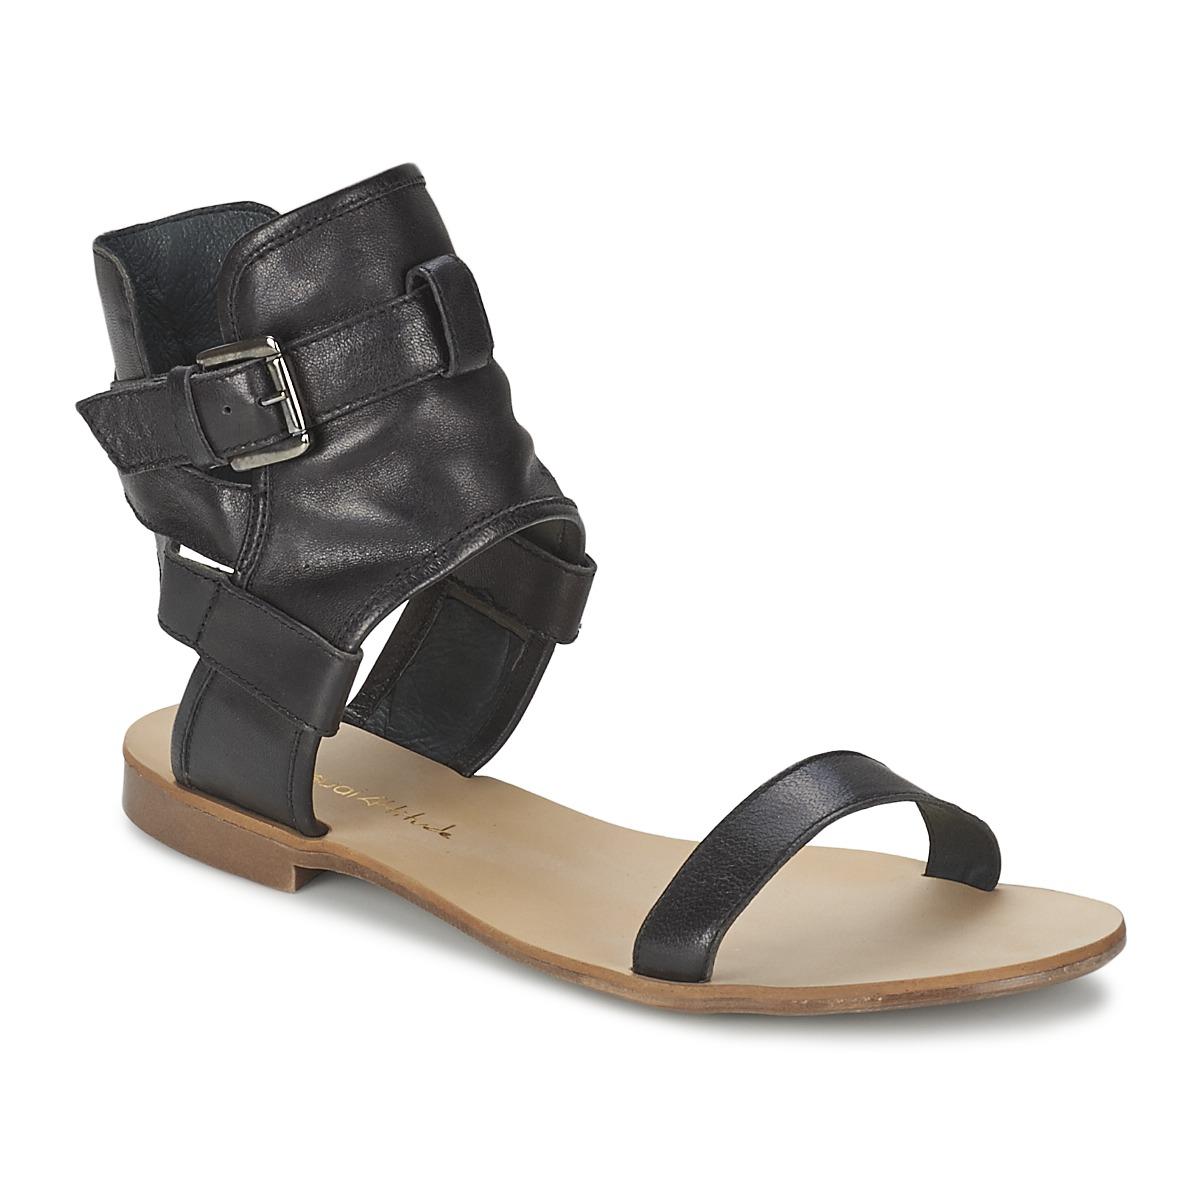 Casual Attitude PANTOLA Schwarz - Kostenloser Versand bei Spartoode ! - Schuhe Sandalen / Sandaletten Damen 47,99 €